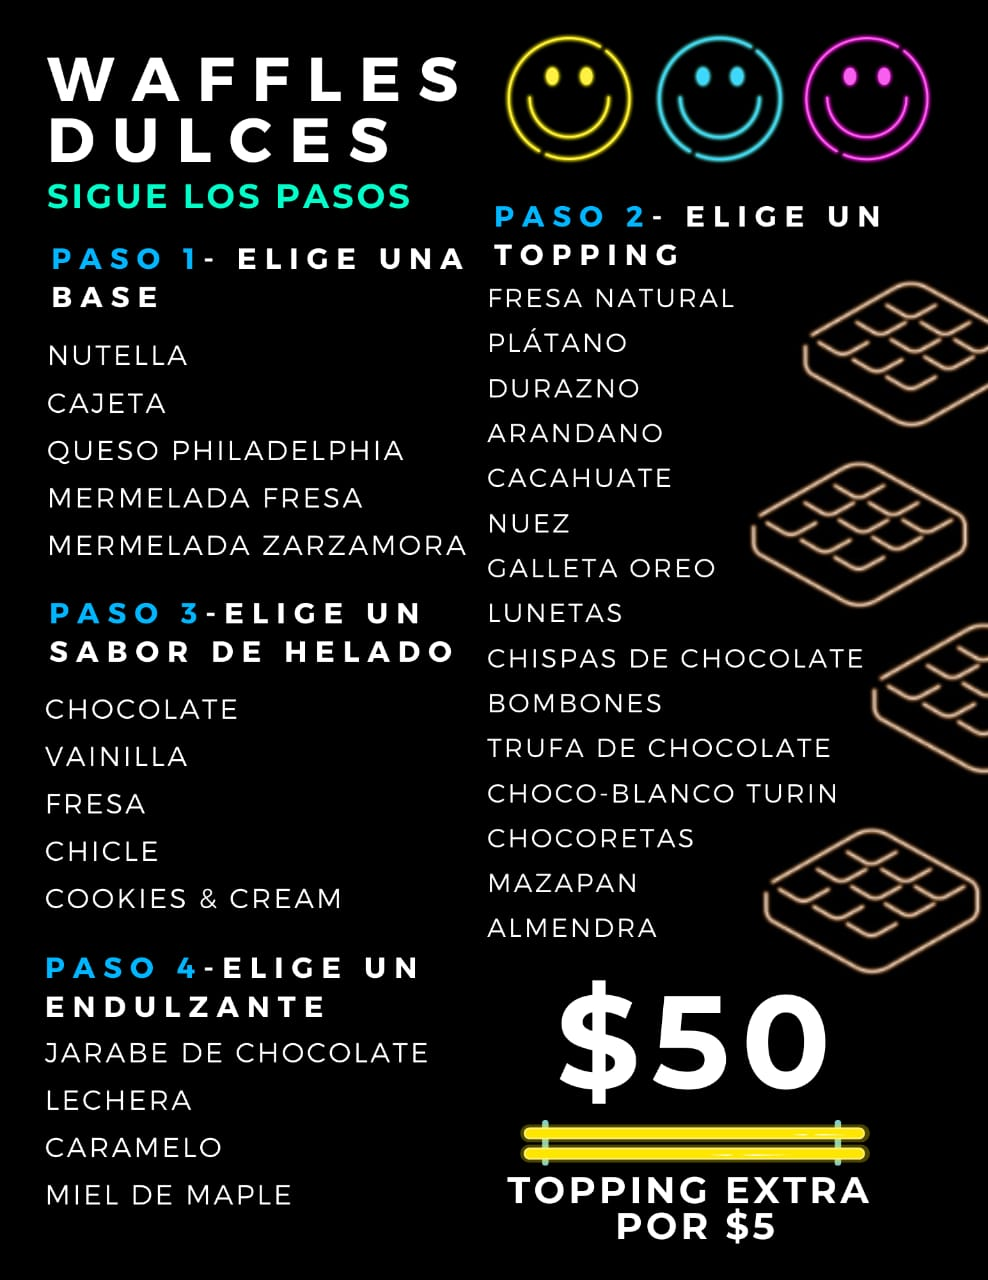 MALI-KREPAS CAFETERÍA